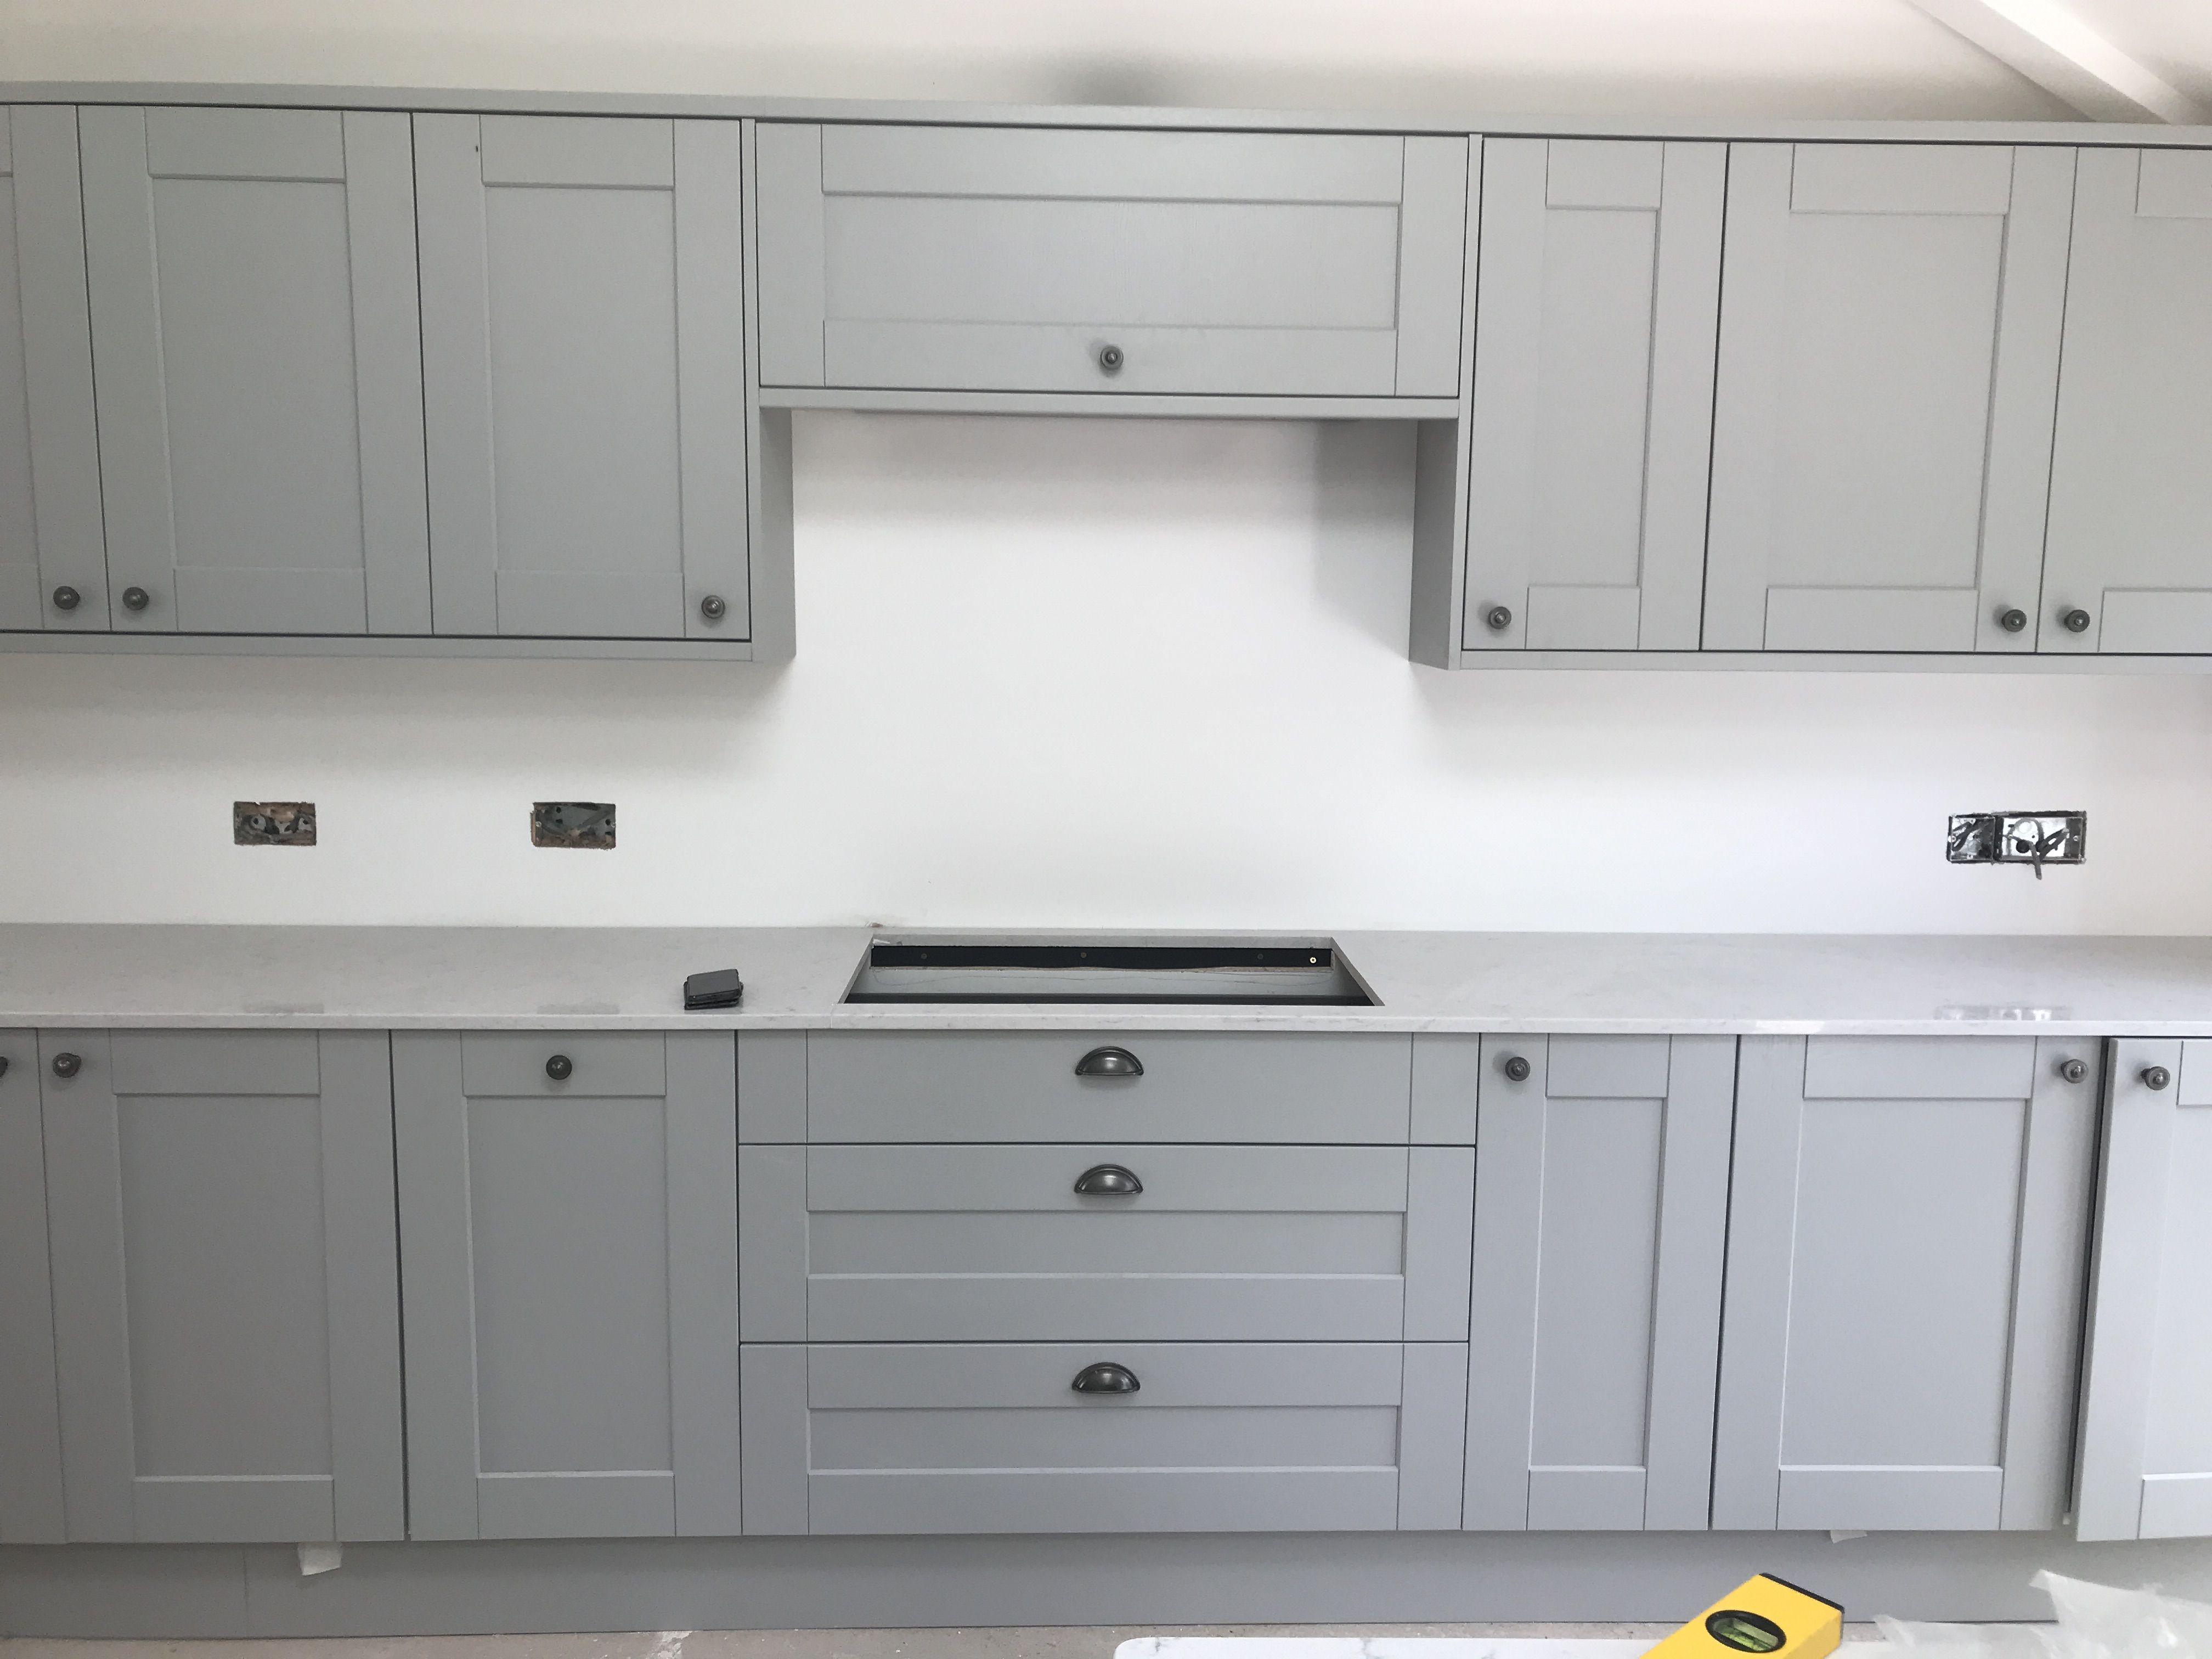 Download Wallpaper White Shaker Kitchen With Grey Worktops